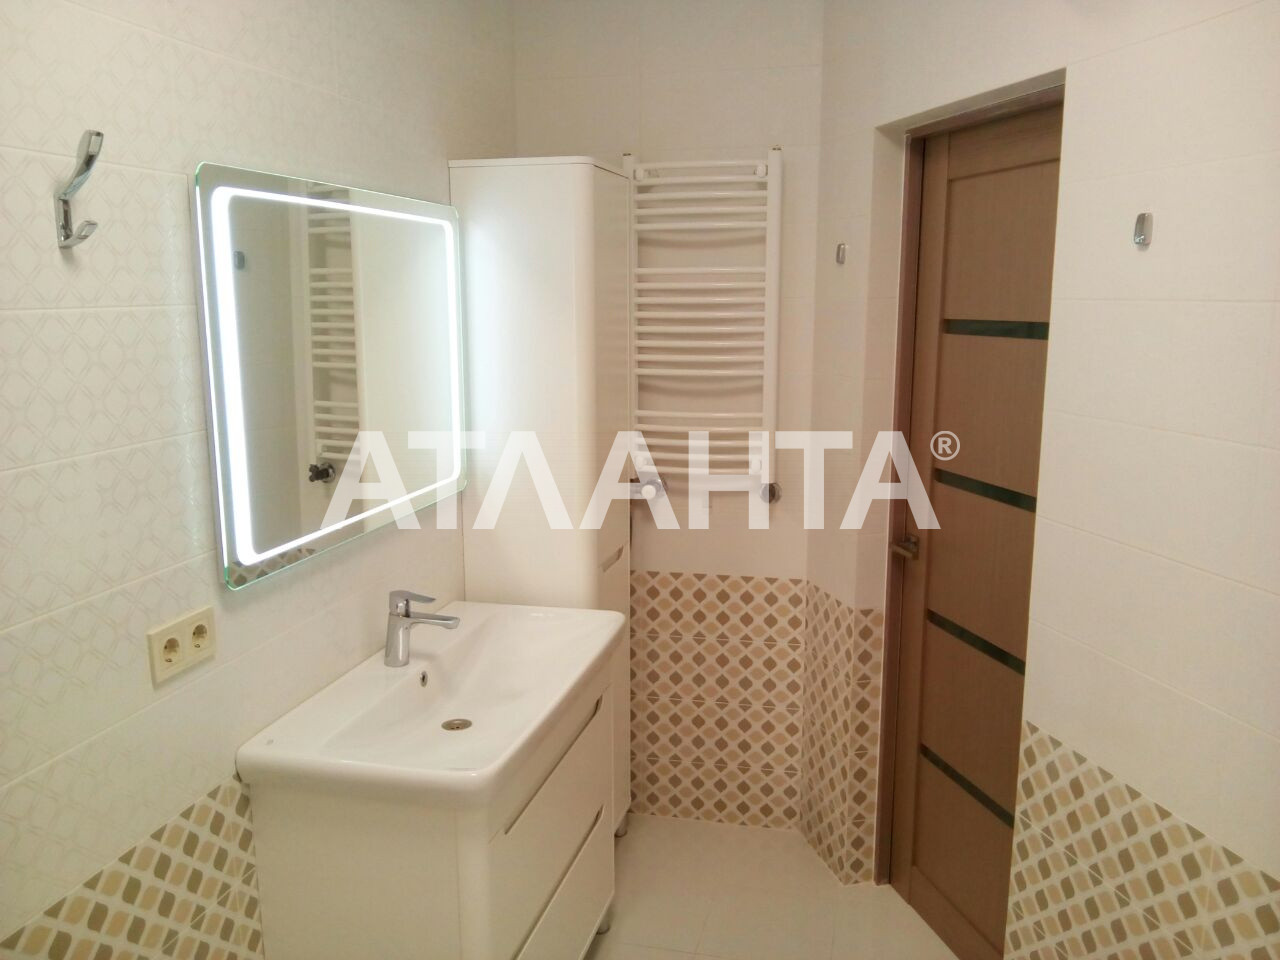 Продается 3-комнатная Квартира на ул. Просп. Глушкова — 139 000 у.е. (фото №11)